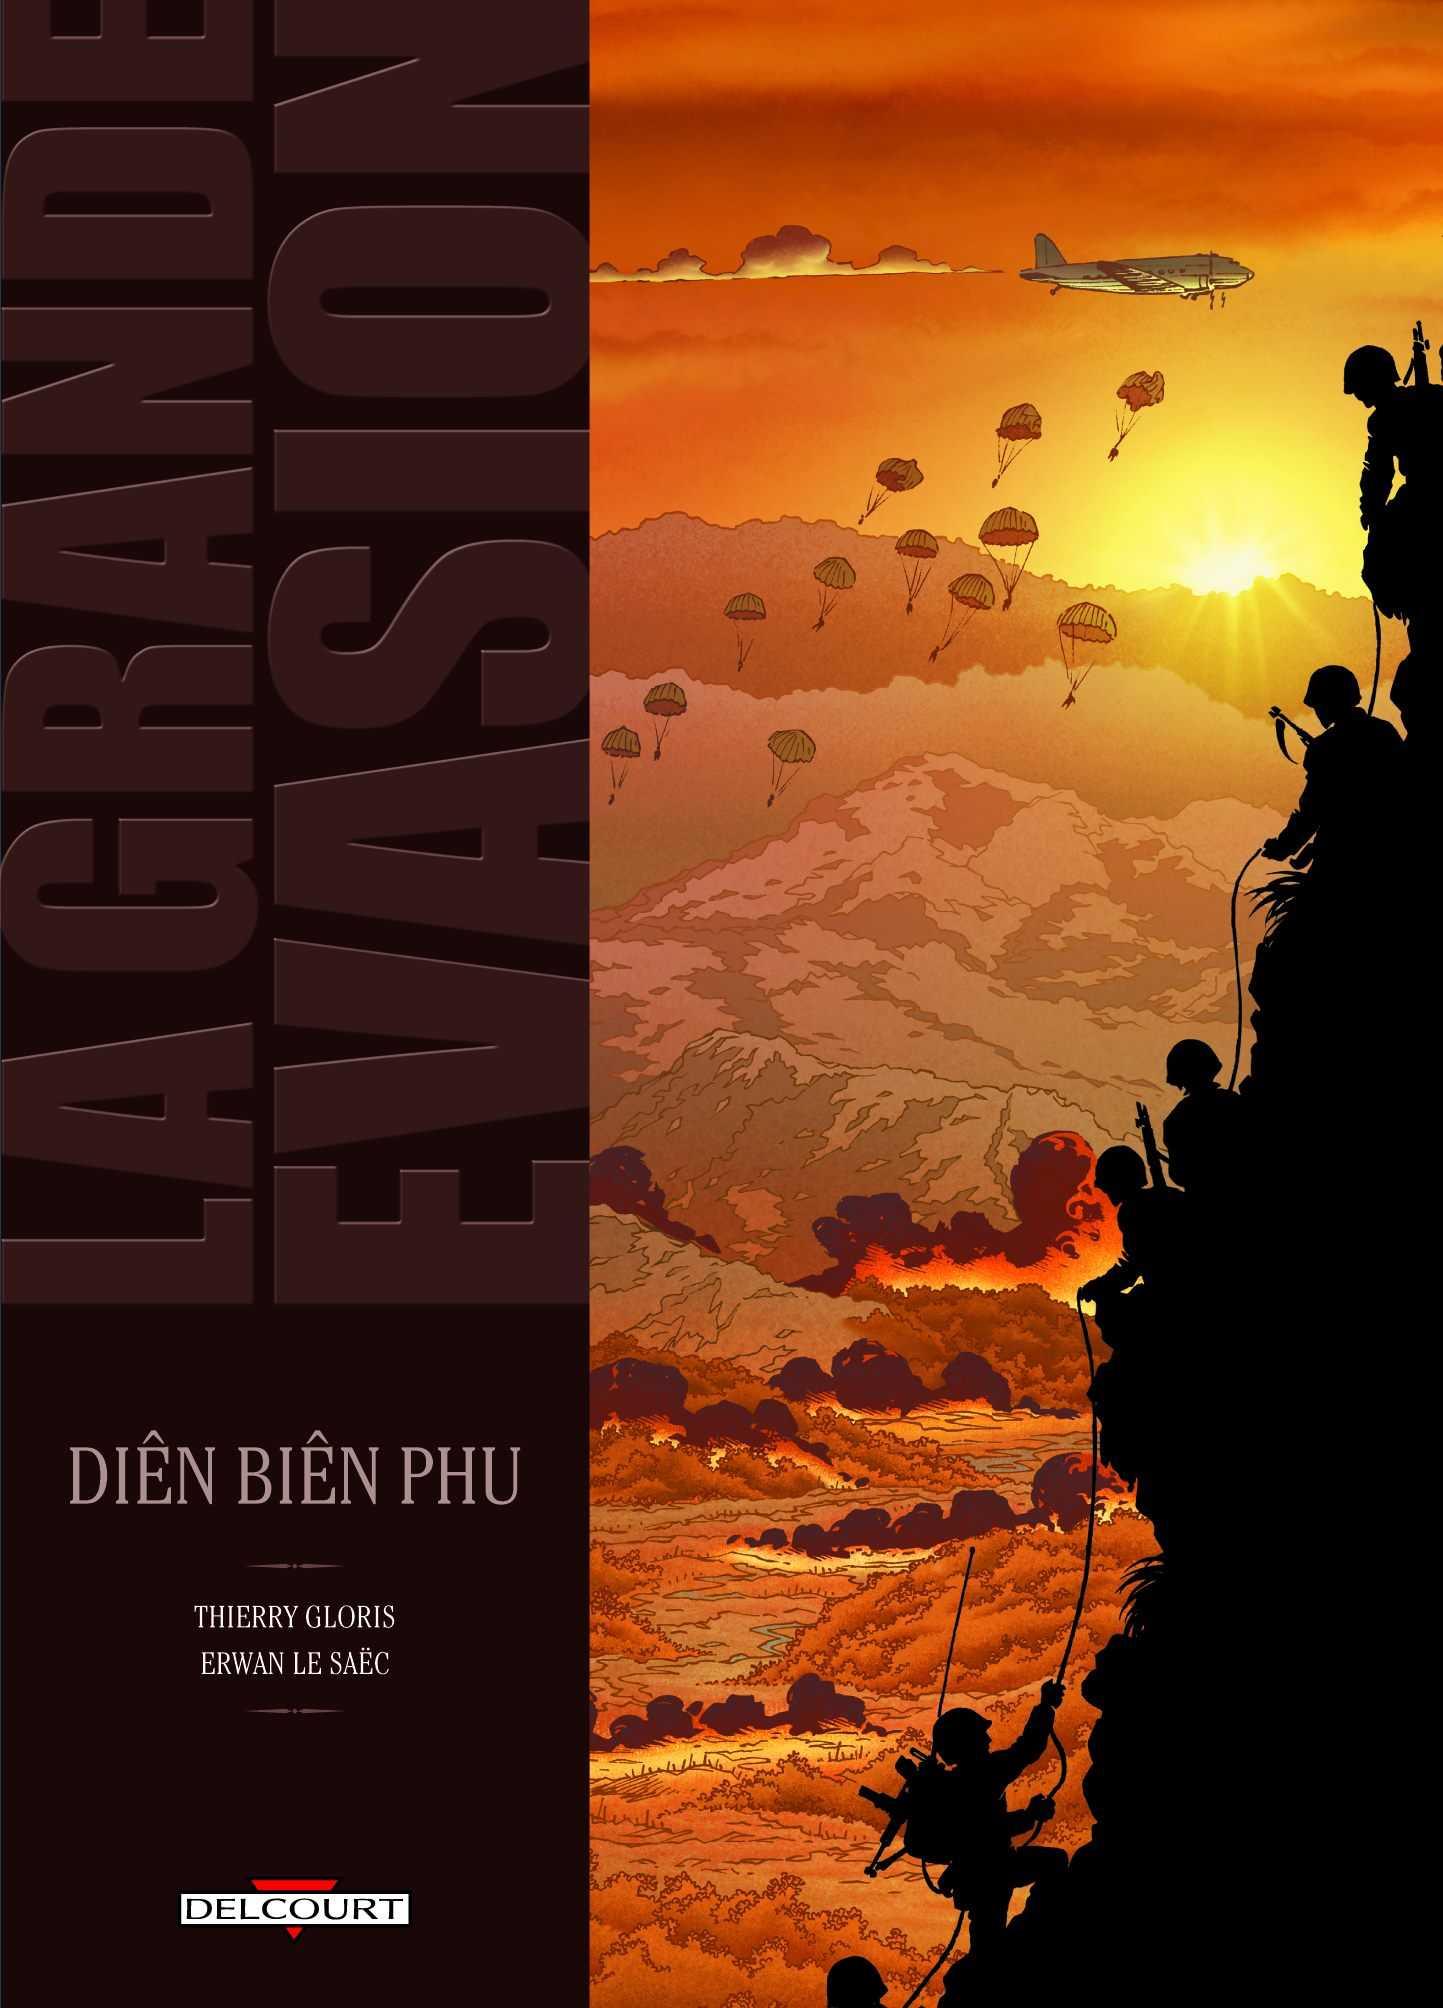 La Grande Évasion : Diên Biên Phu, un piège mortel